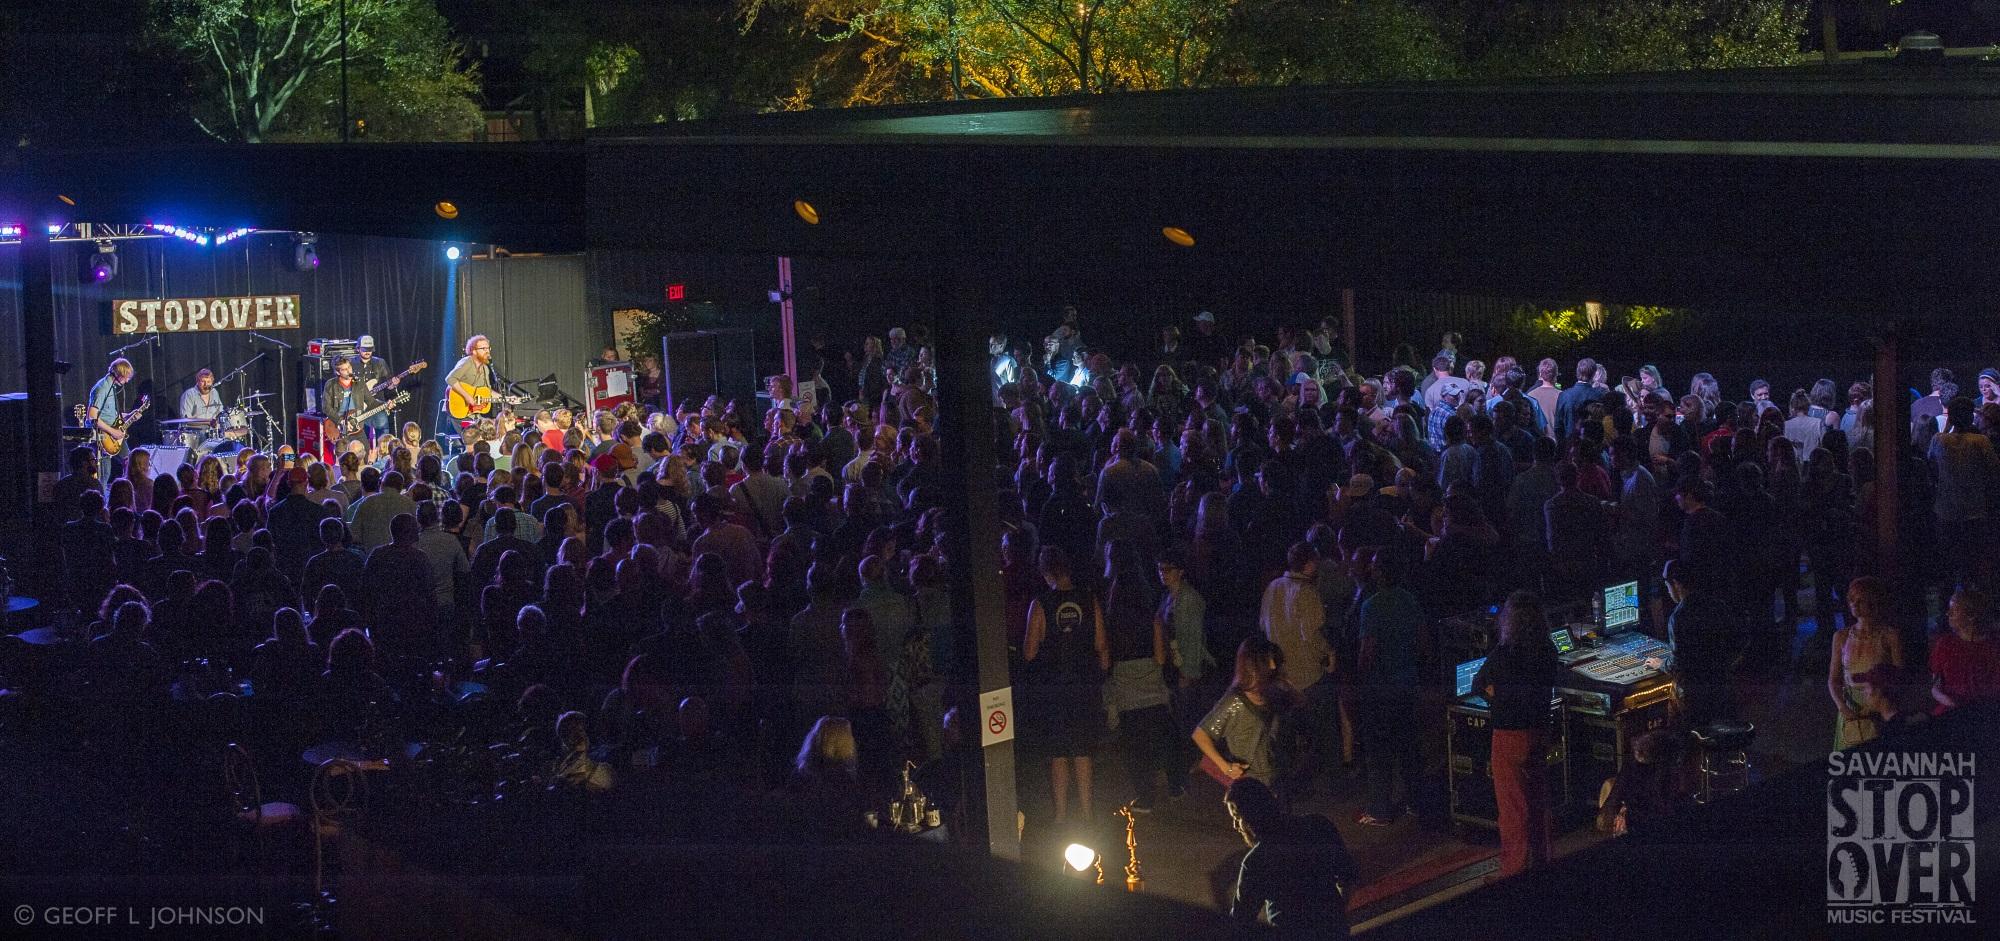 BlitzenTrapper crowd #2 2016.jpg